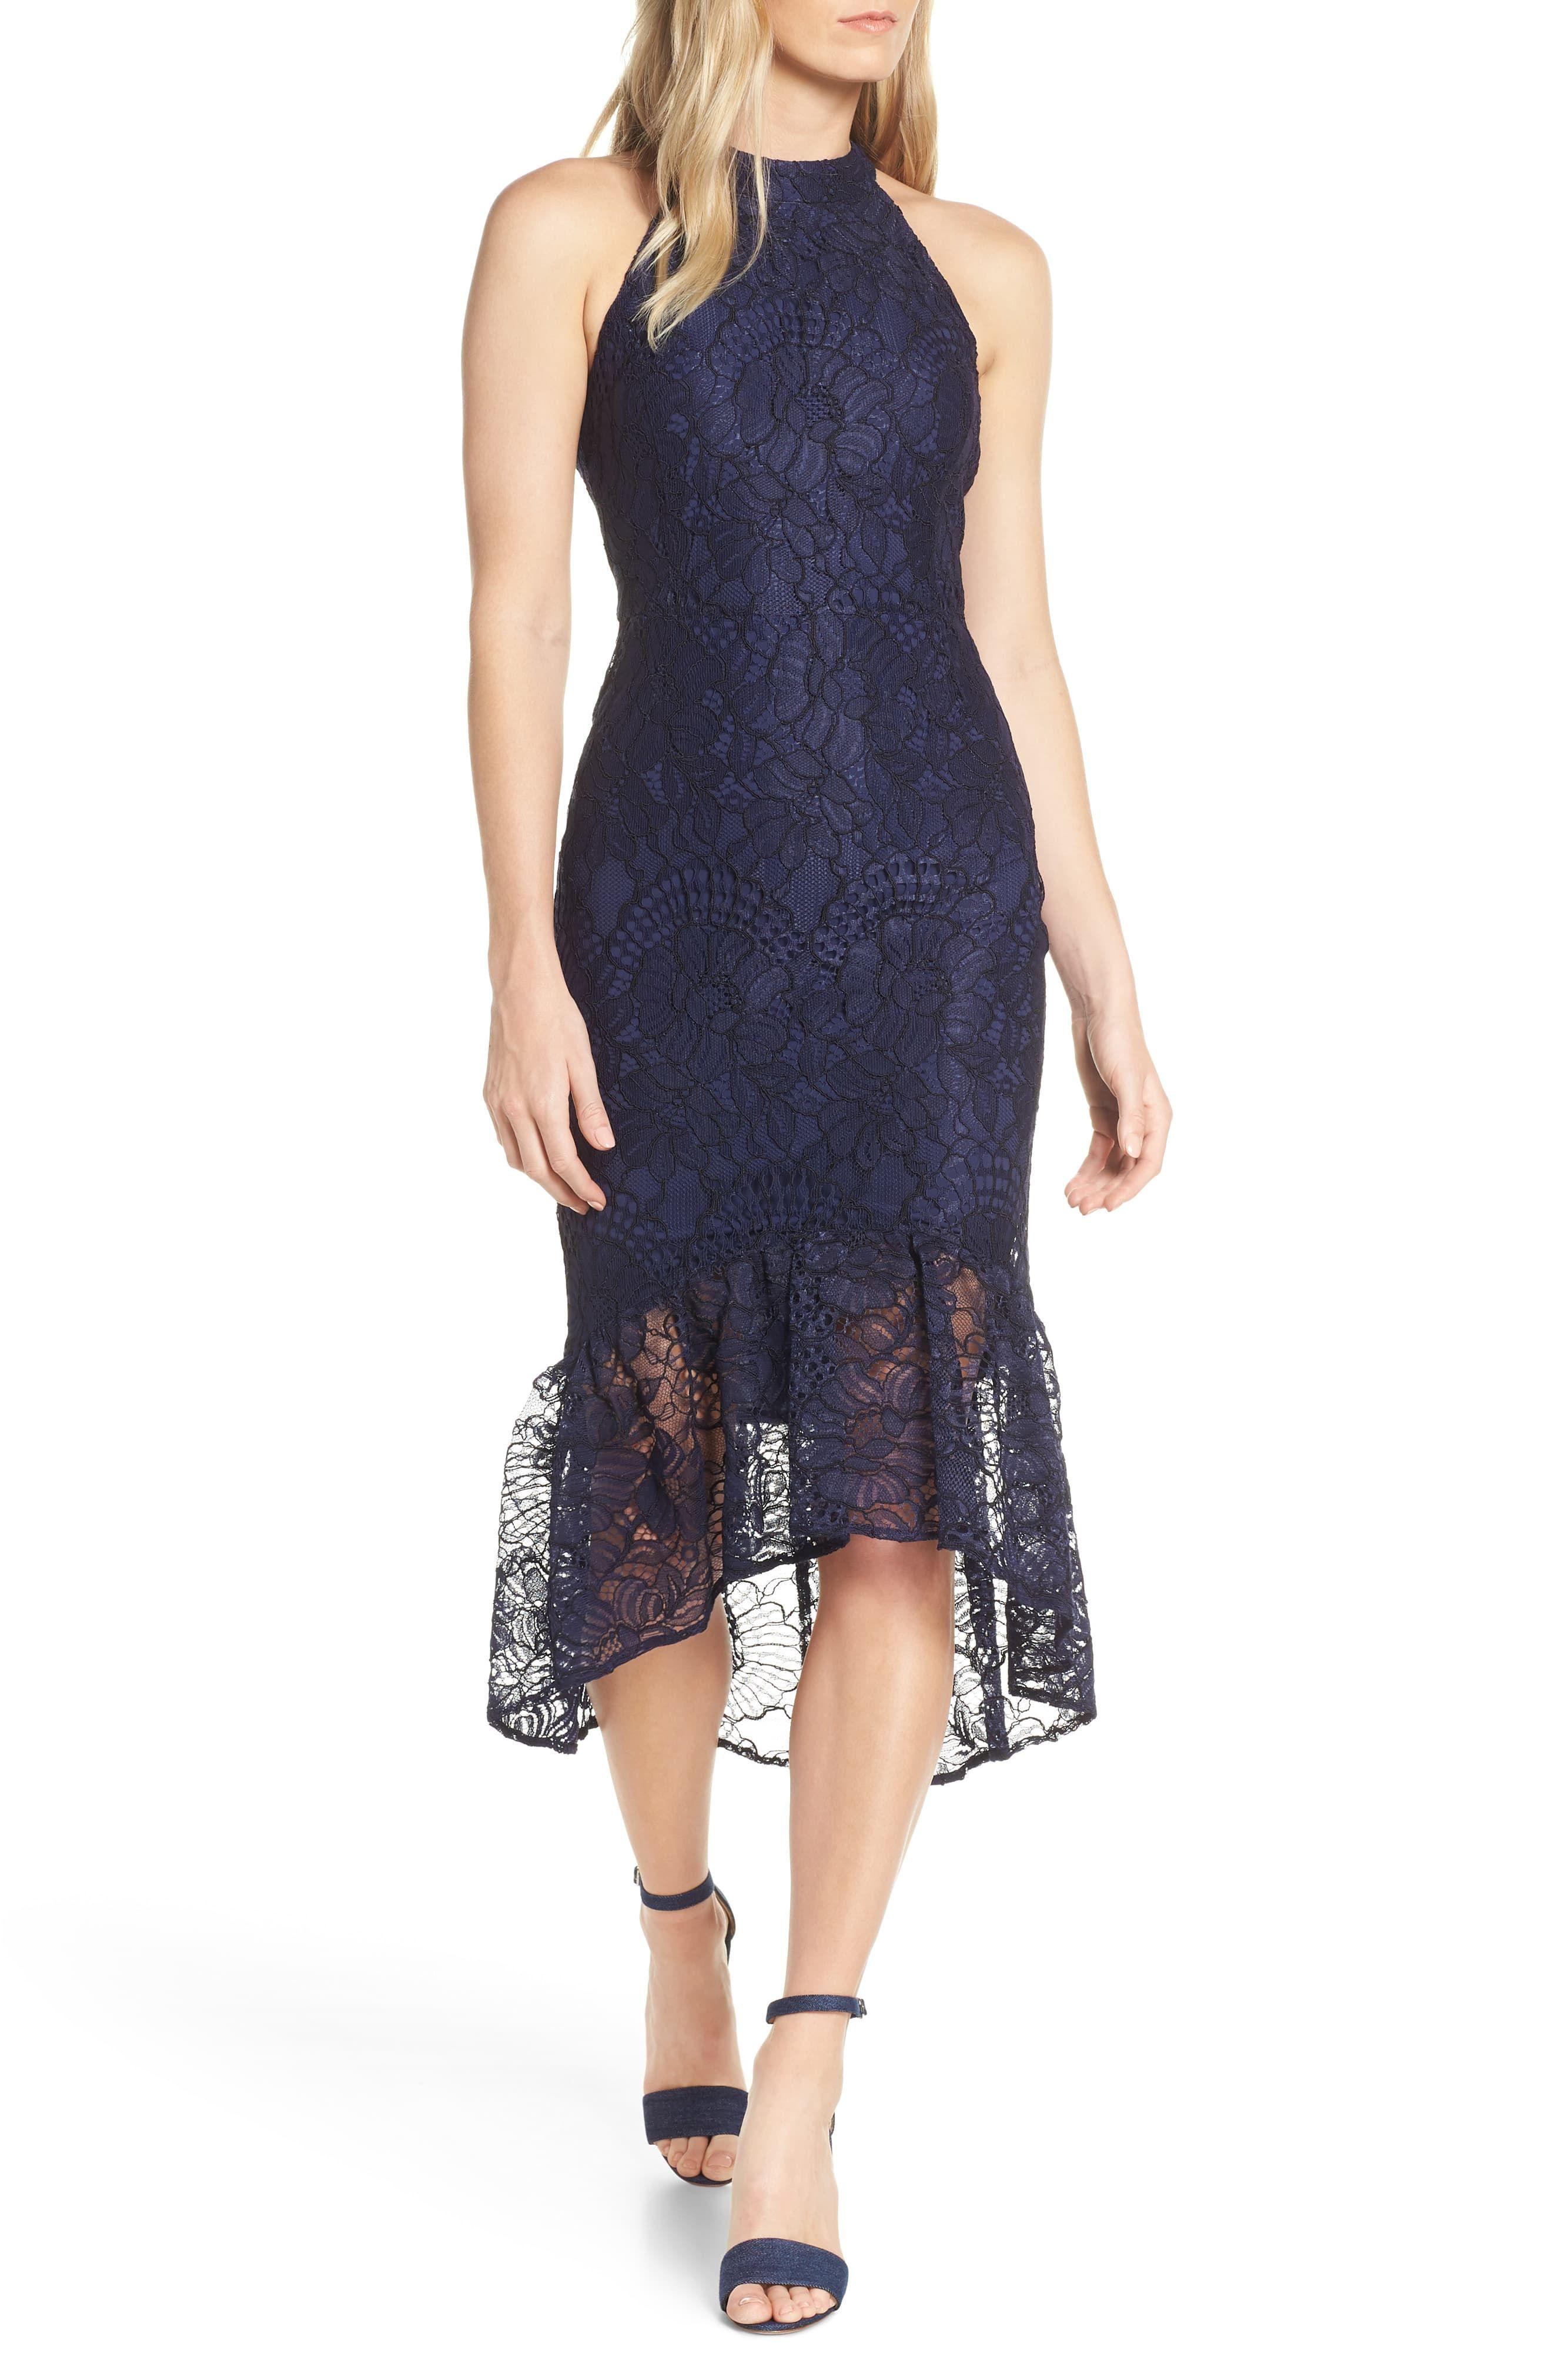 Chelsea28 Womens Halter High Low Maxi Dress Blue Floral Size Medium